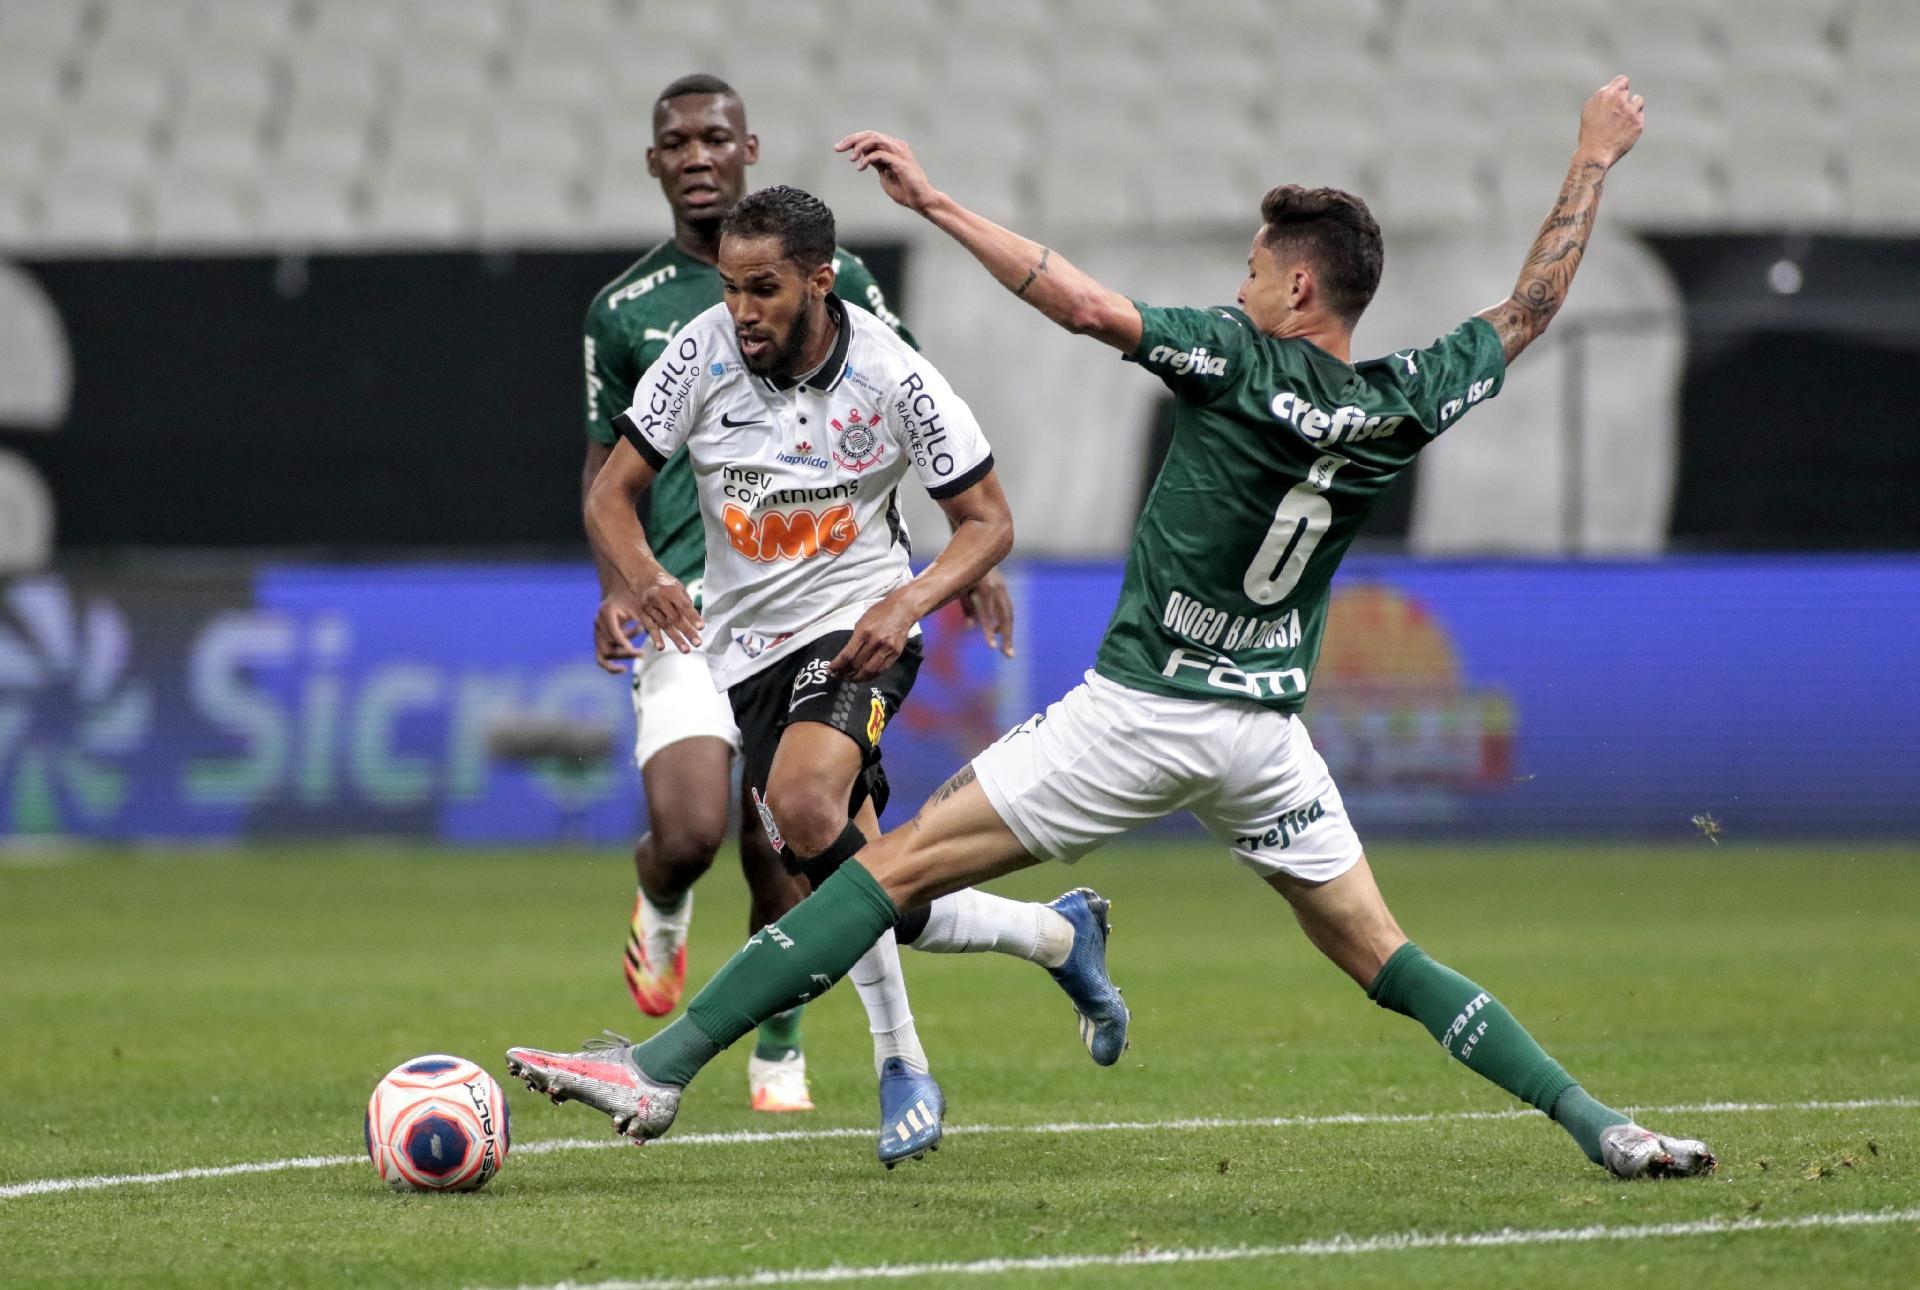 Everaldo tenta transmitir o sinal de Diogo Barbosa durante a partida Corinthians e Palmeiras - Rodrigo Coca / Agência Corinthians